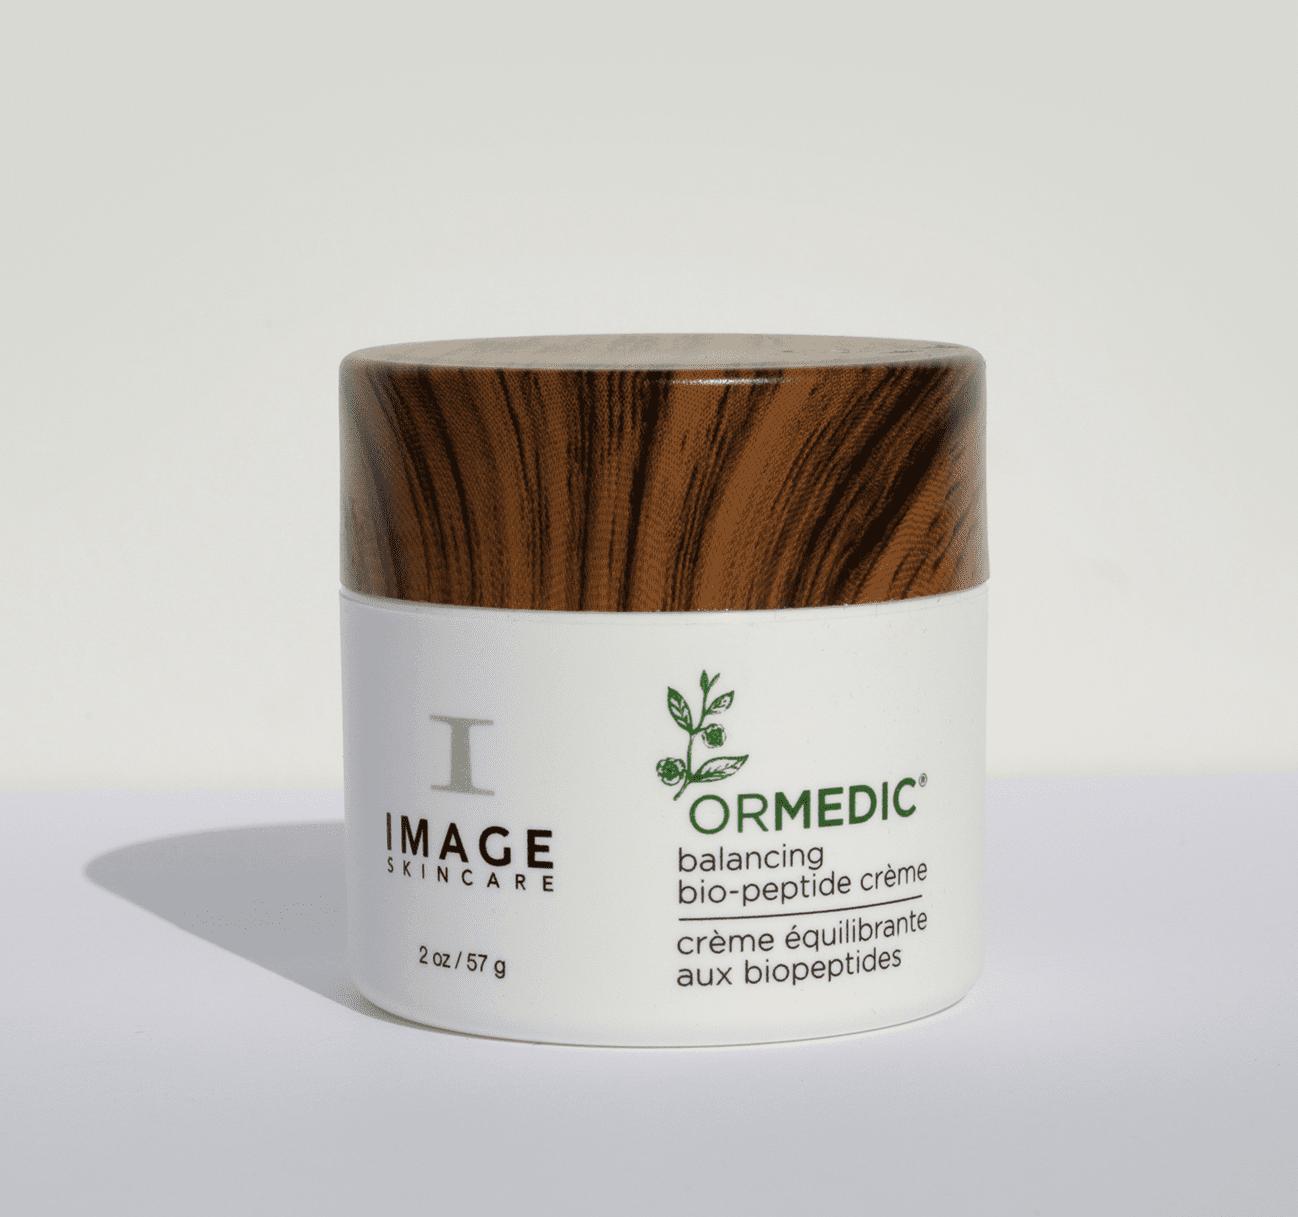 ORMEDIC_Balancing-bio-peptide-creme